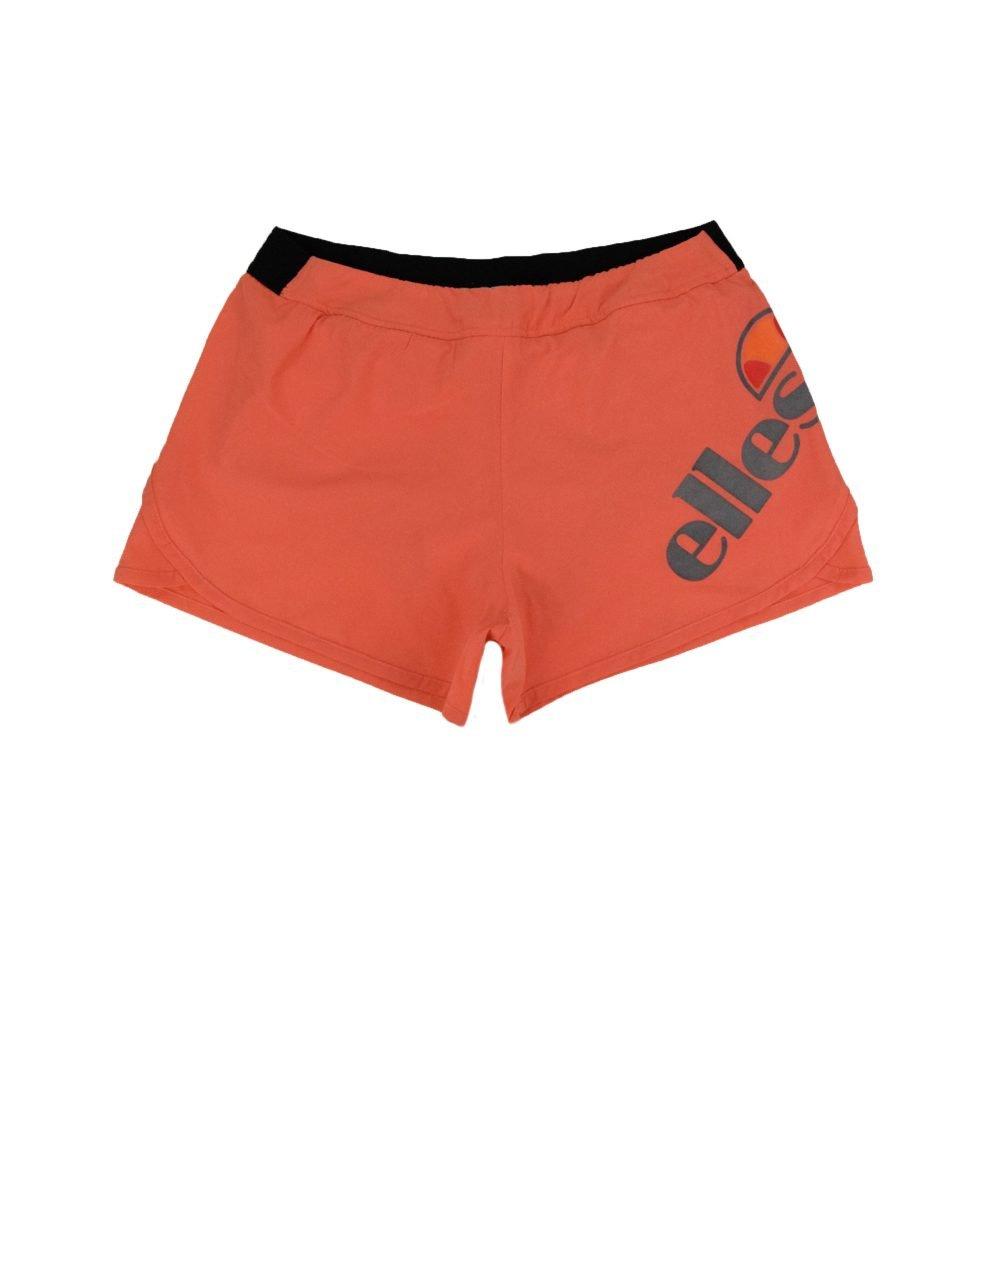 Ellesse Firestar Short (SRA06509) Orange